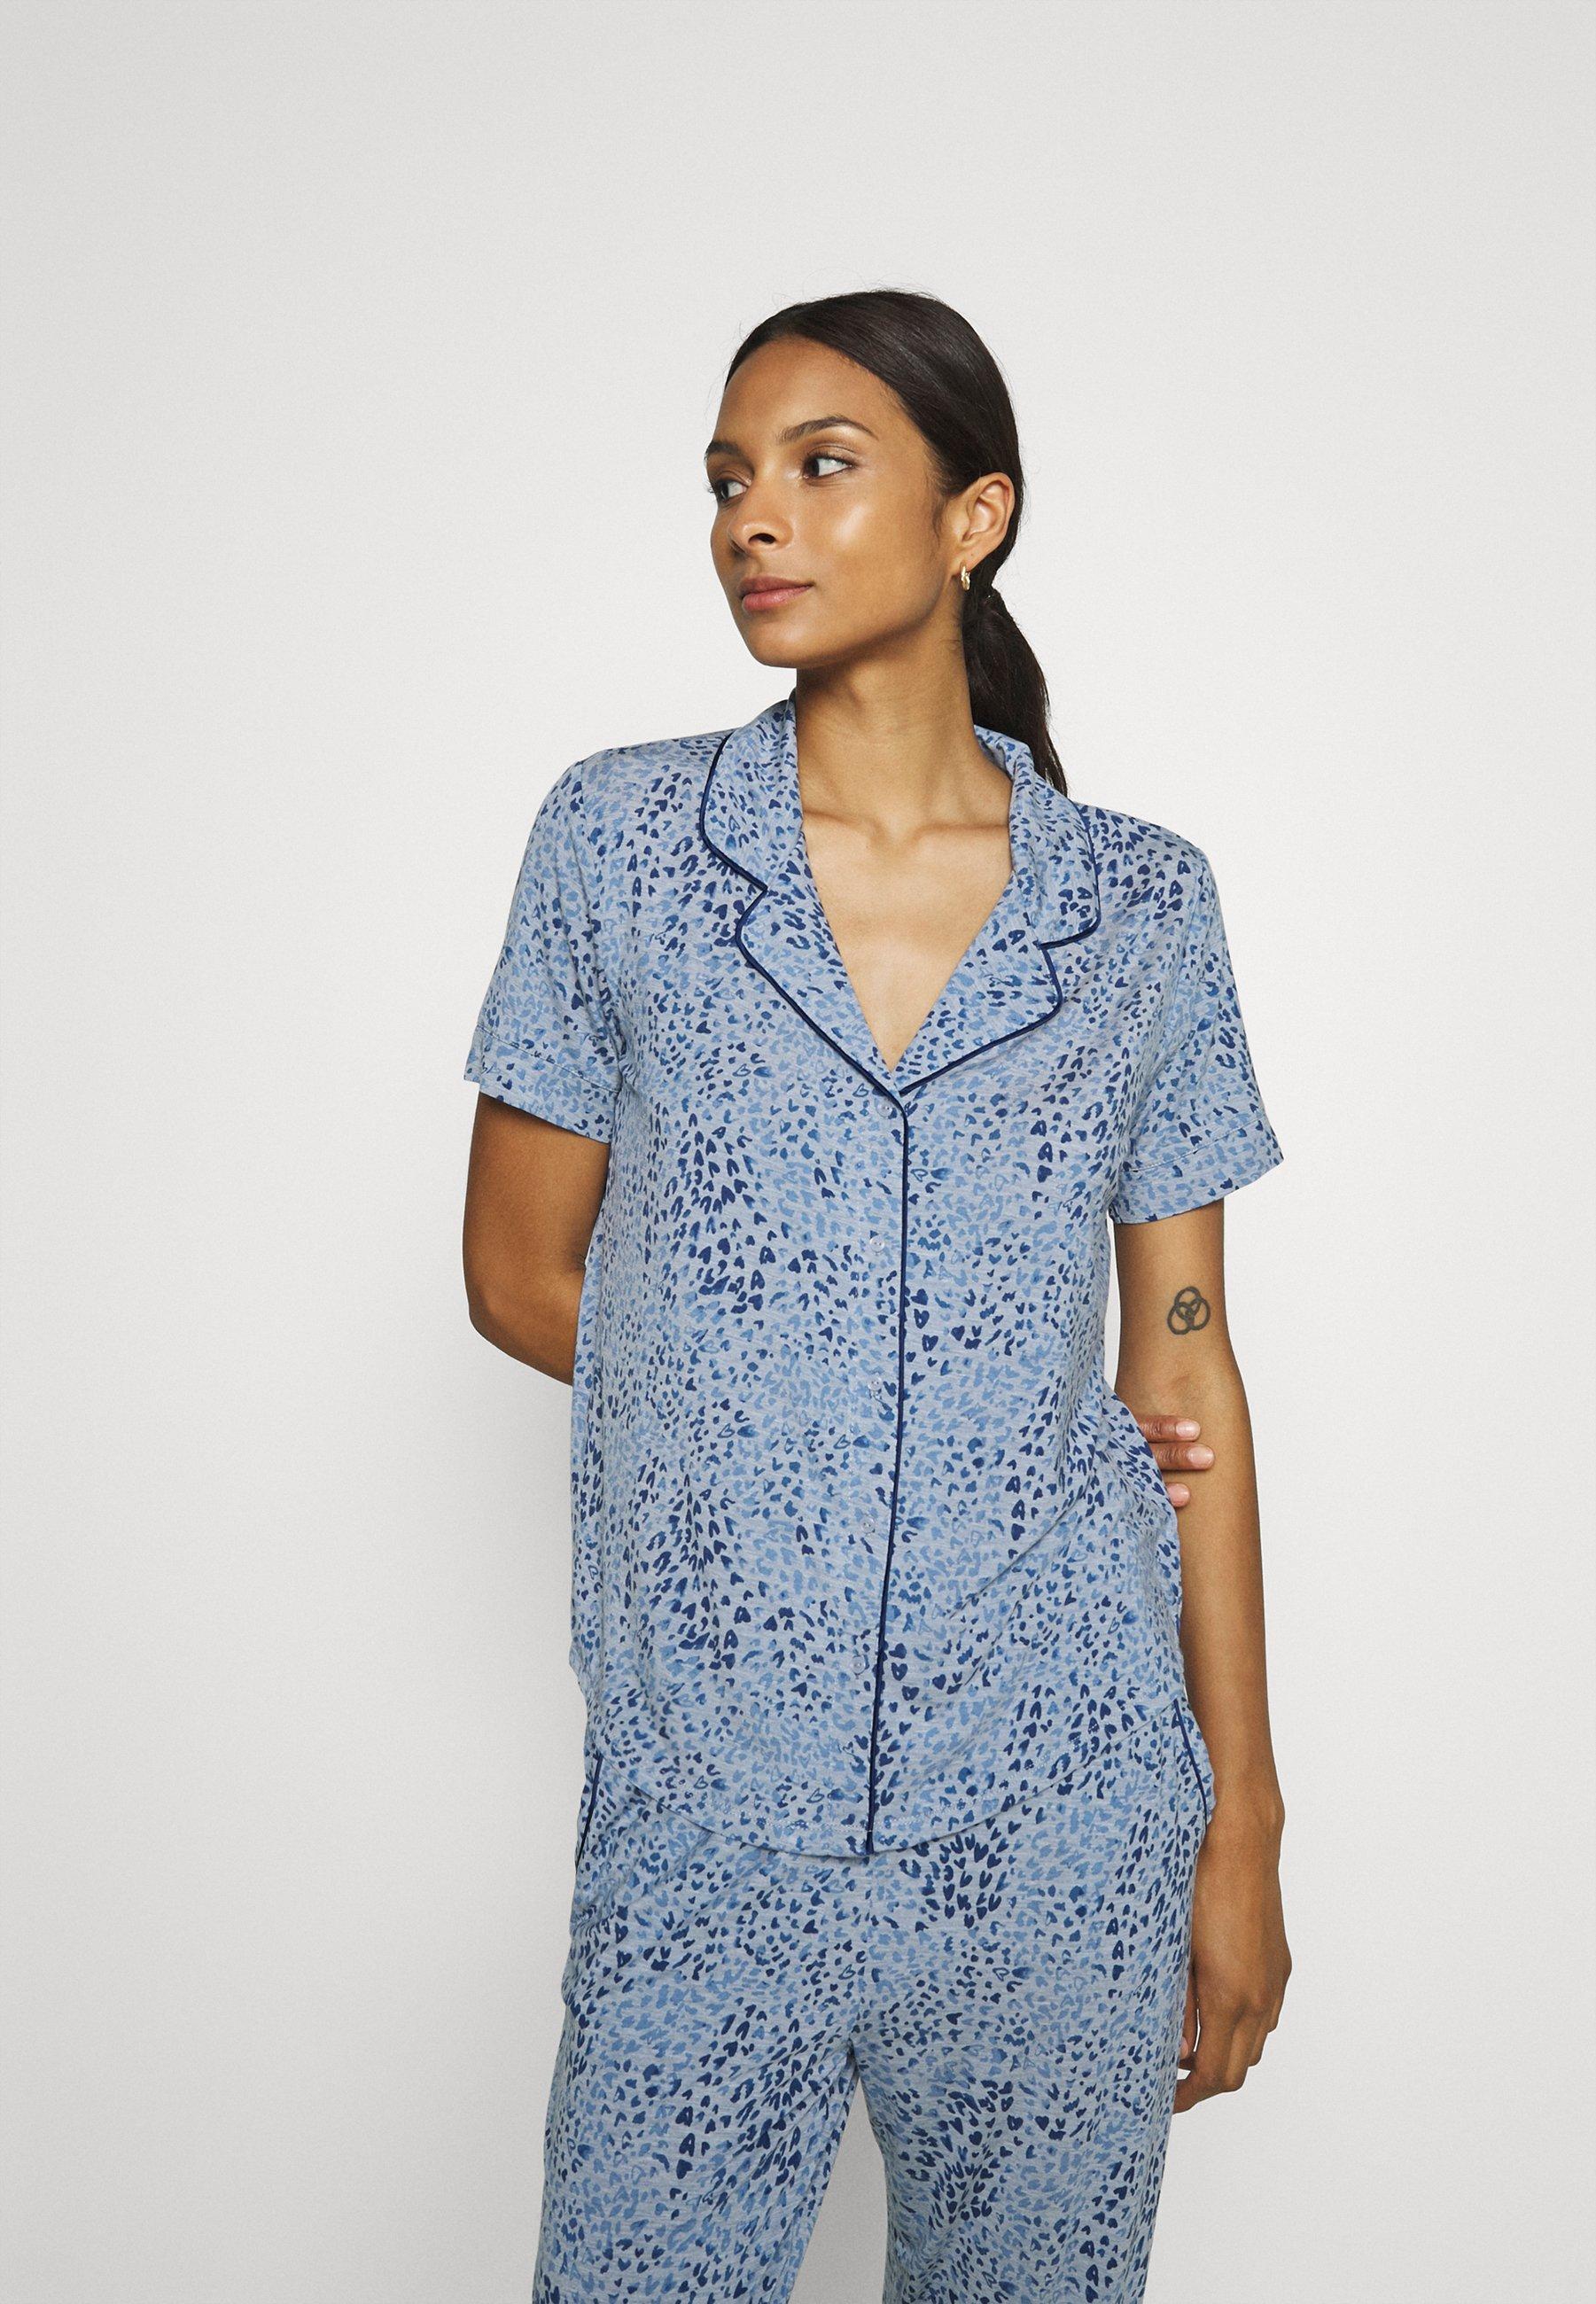 Damen PIPING  - Nachtwäsche Shirt